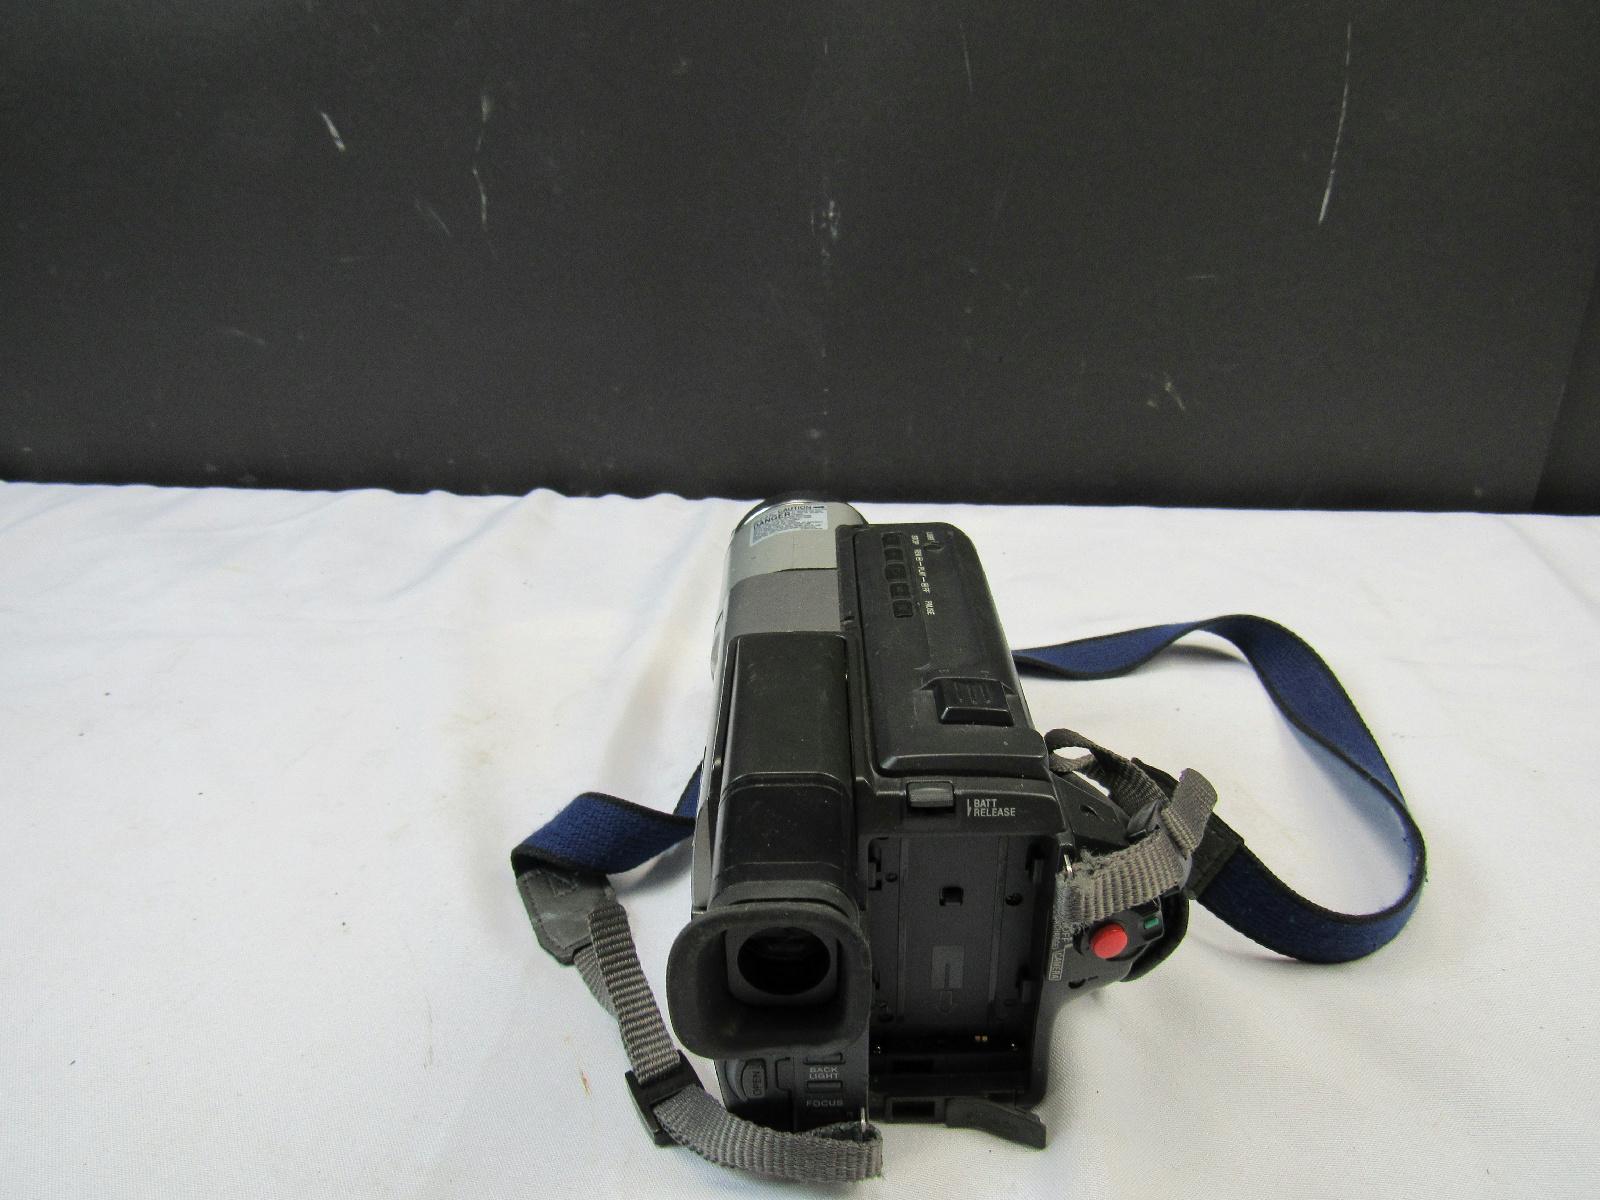 sony ccd trv68 ntsc hi8 handycam vision camcorder Sony Handycam Camcorder Manual